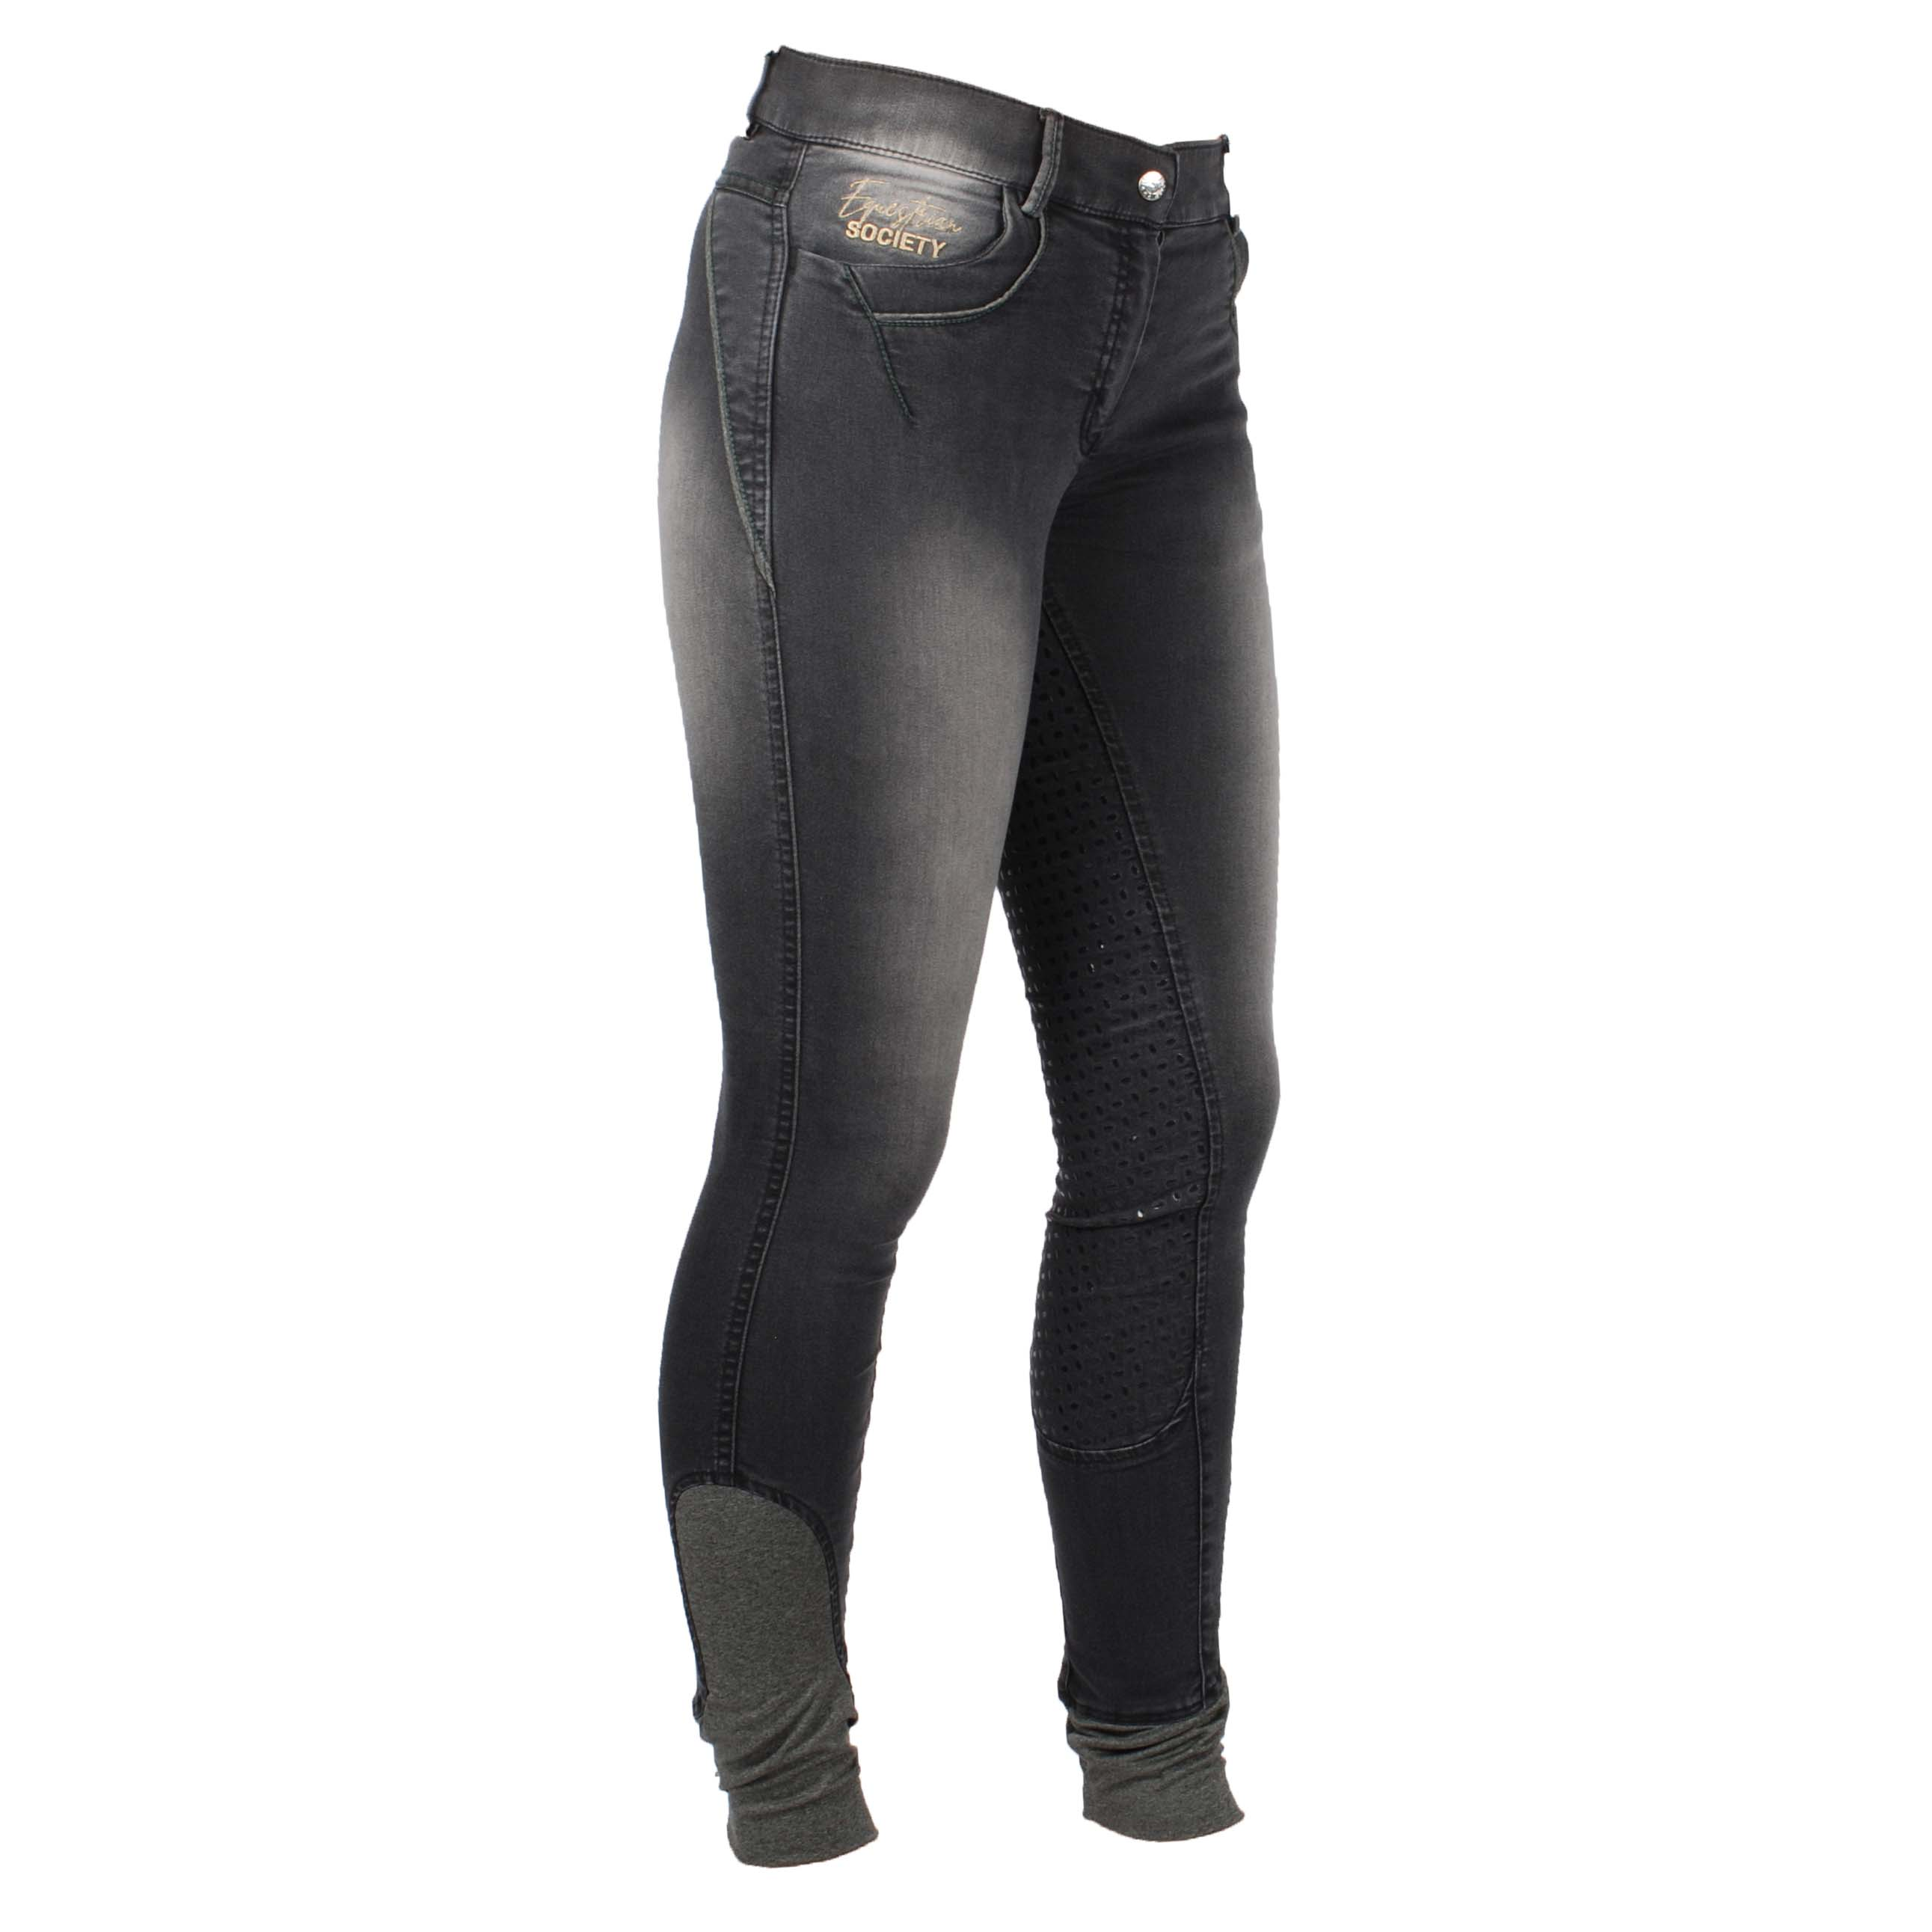 Harrys Horse Greyton FG jeans rijbroek zwart maat:36